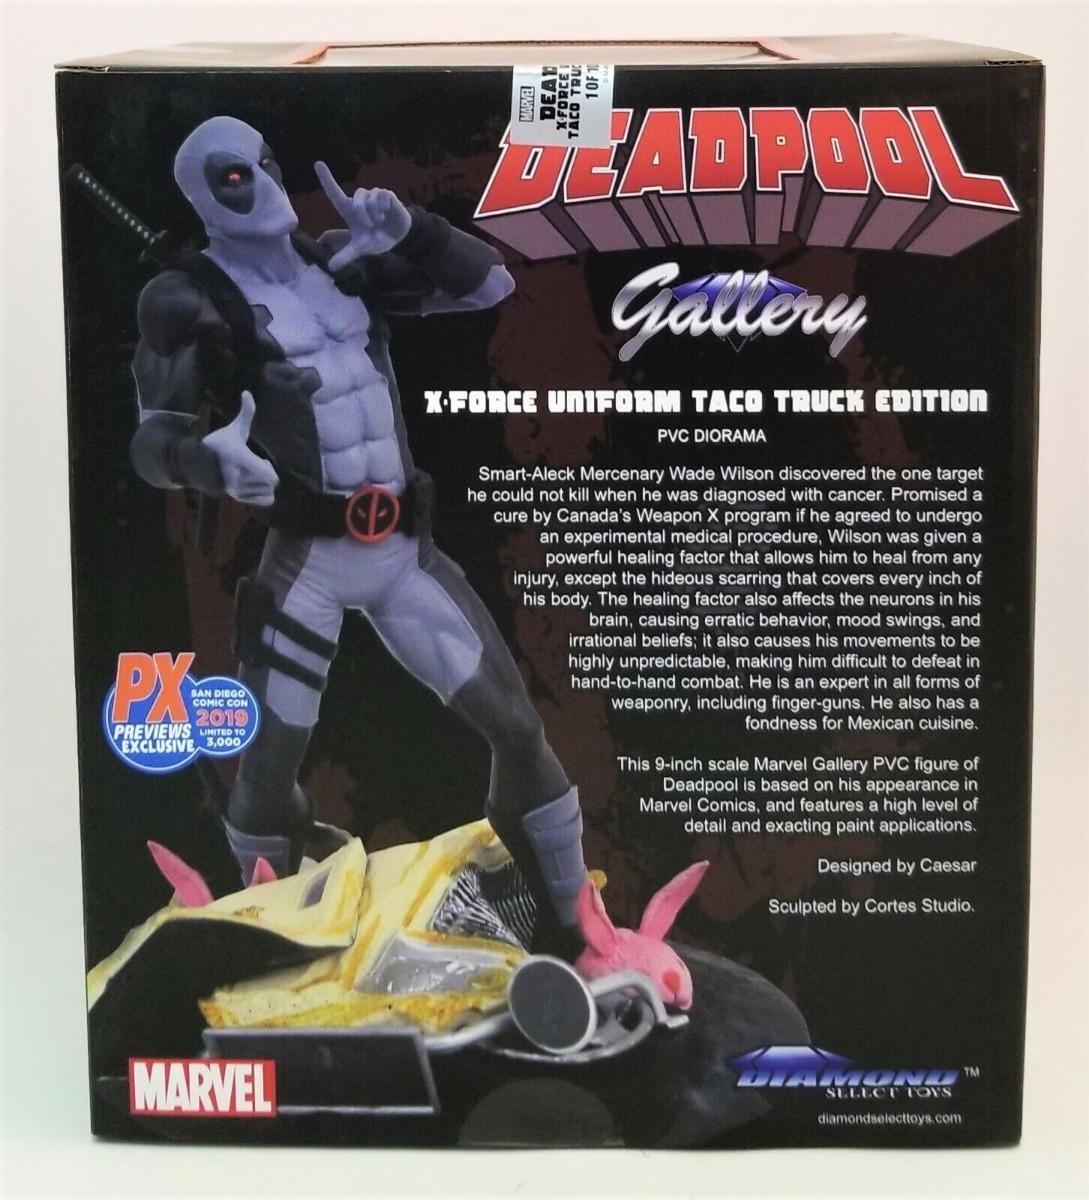 San Diego comic-con 2019 Galería De Marvel X-Force Taco Truck Deadpool Estatua